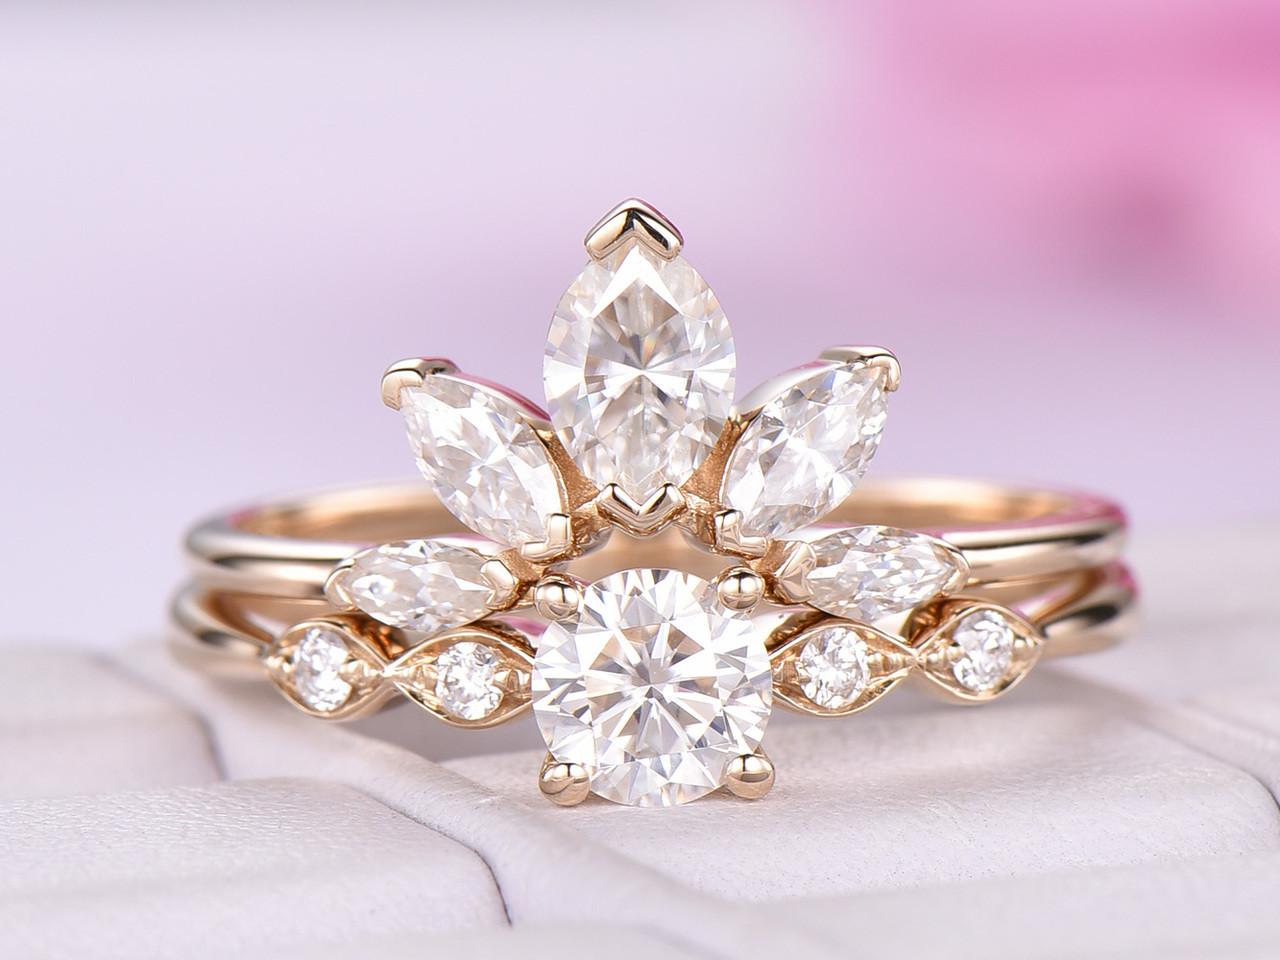 Moissanite Wedding Ring Diamond Alternative Engagement Ring Tiara Ring Moissanite Crown Engagement Ring Sterling Silver Crown Ring